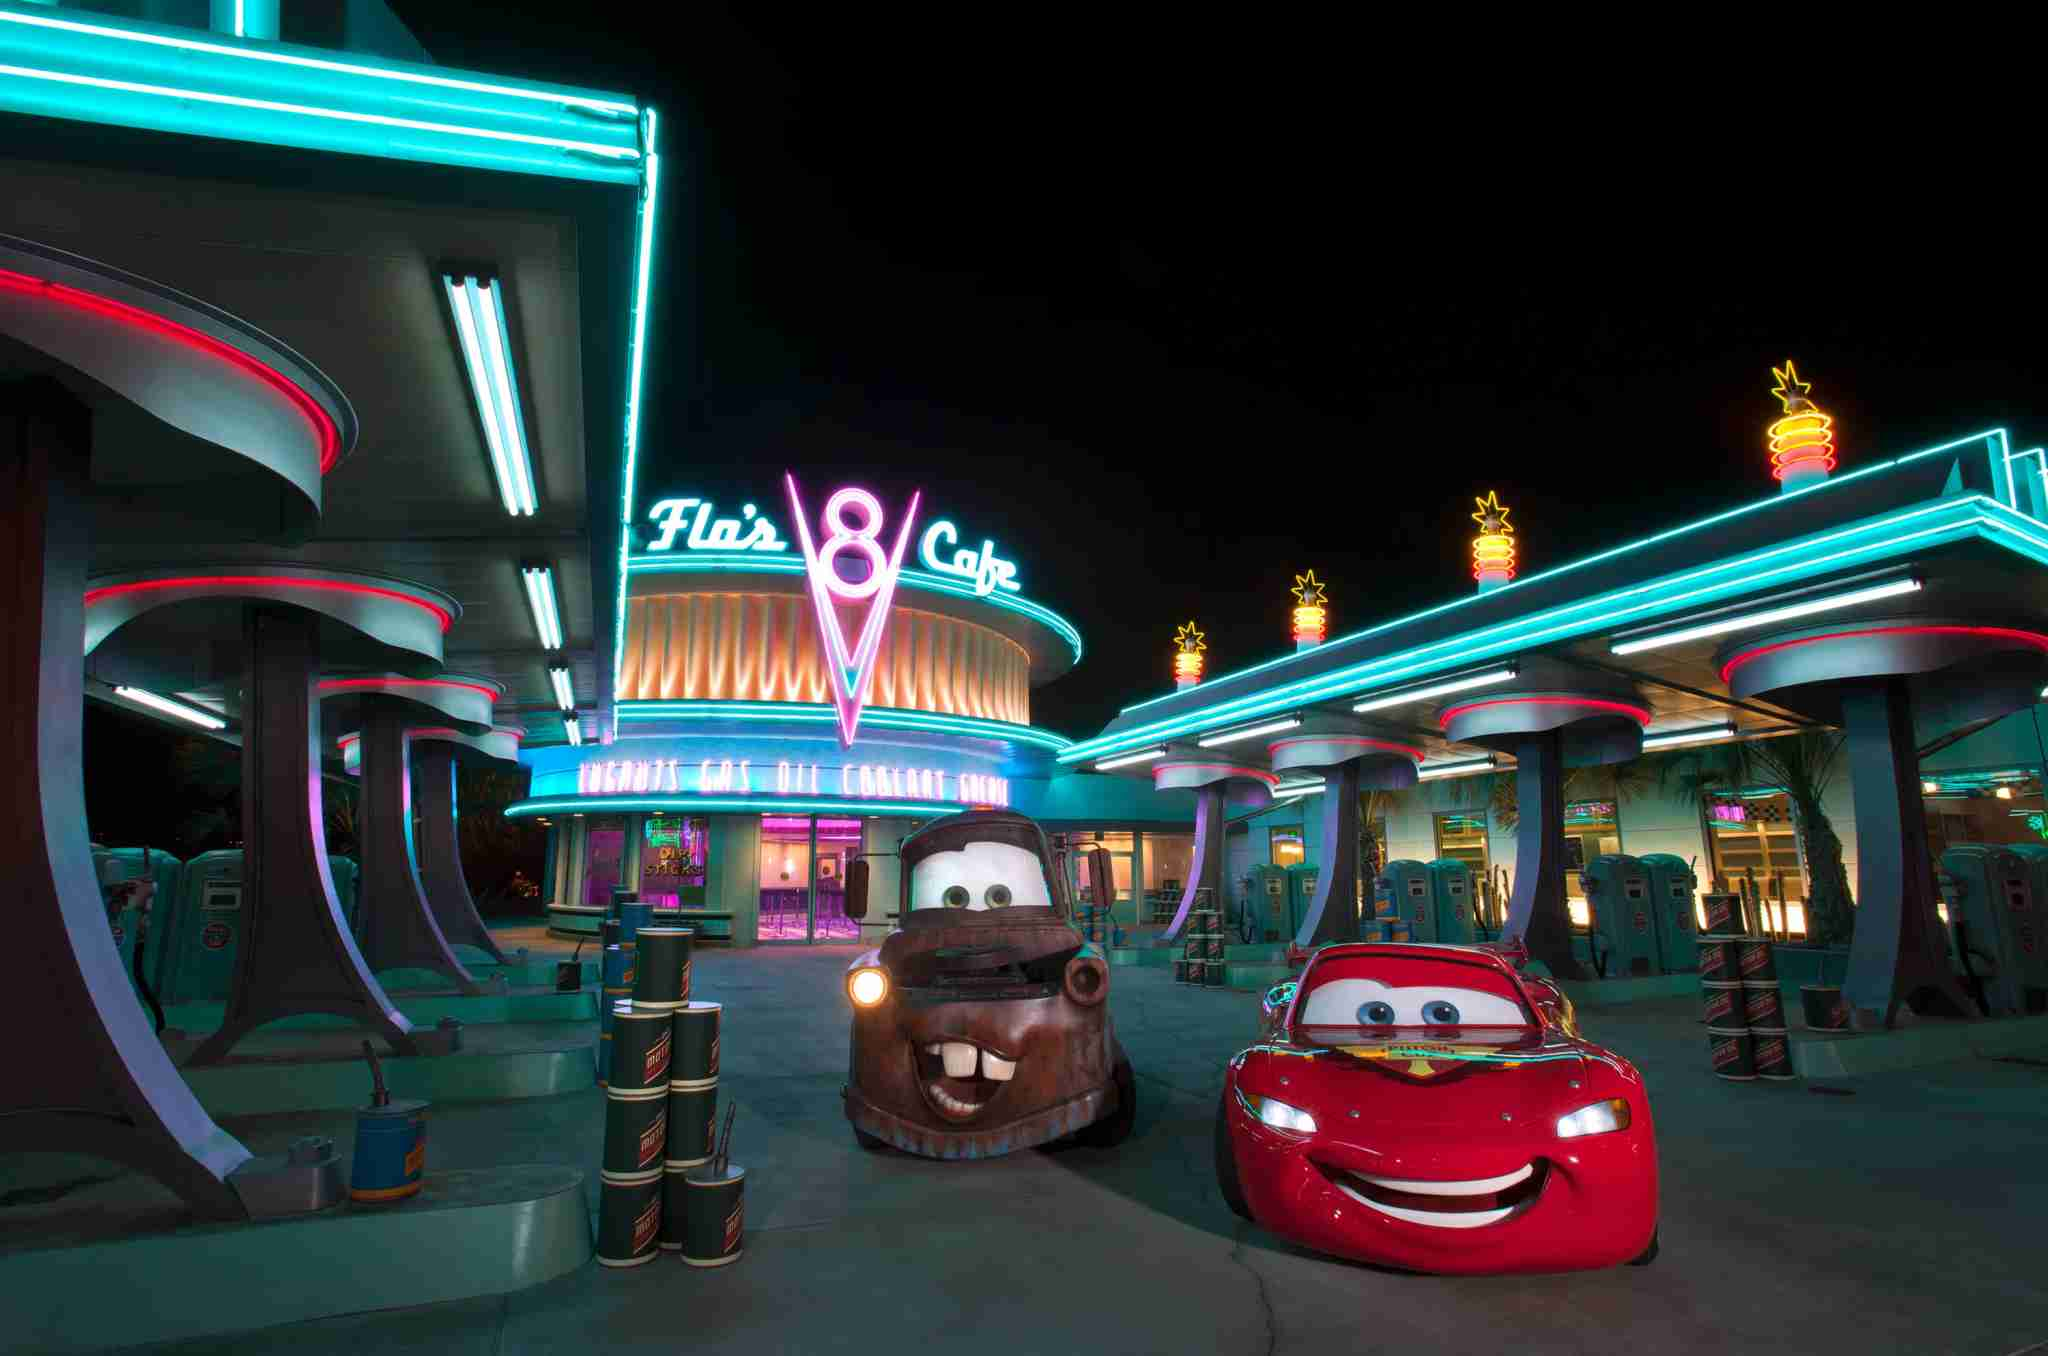 Best Disneyland Restaurants for Families - Flos V8 in Cars Land